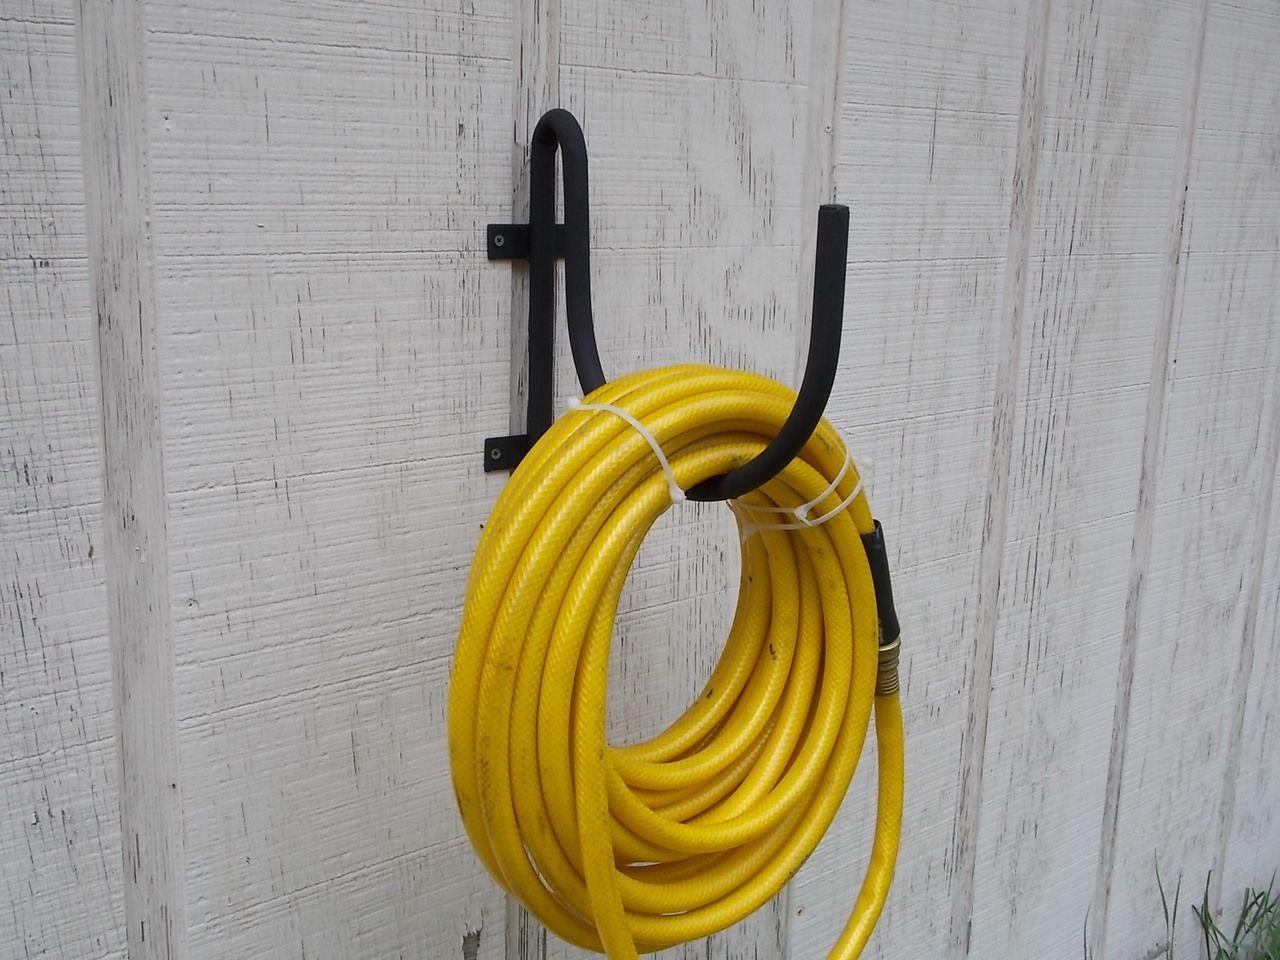 Wall mount garden hose holder black wrought iron | Garden hose ...